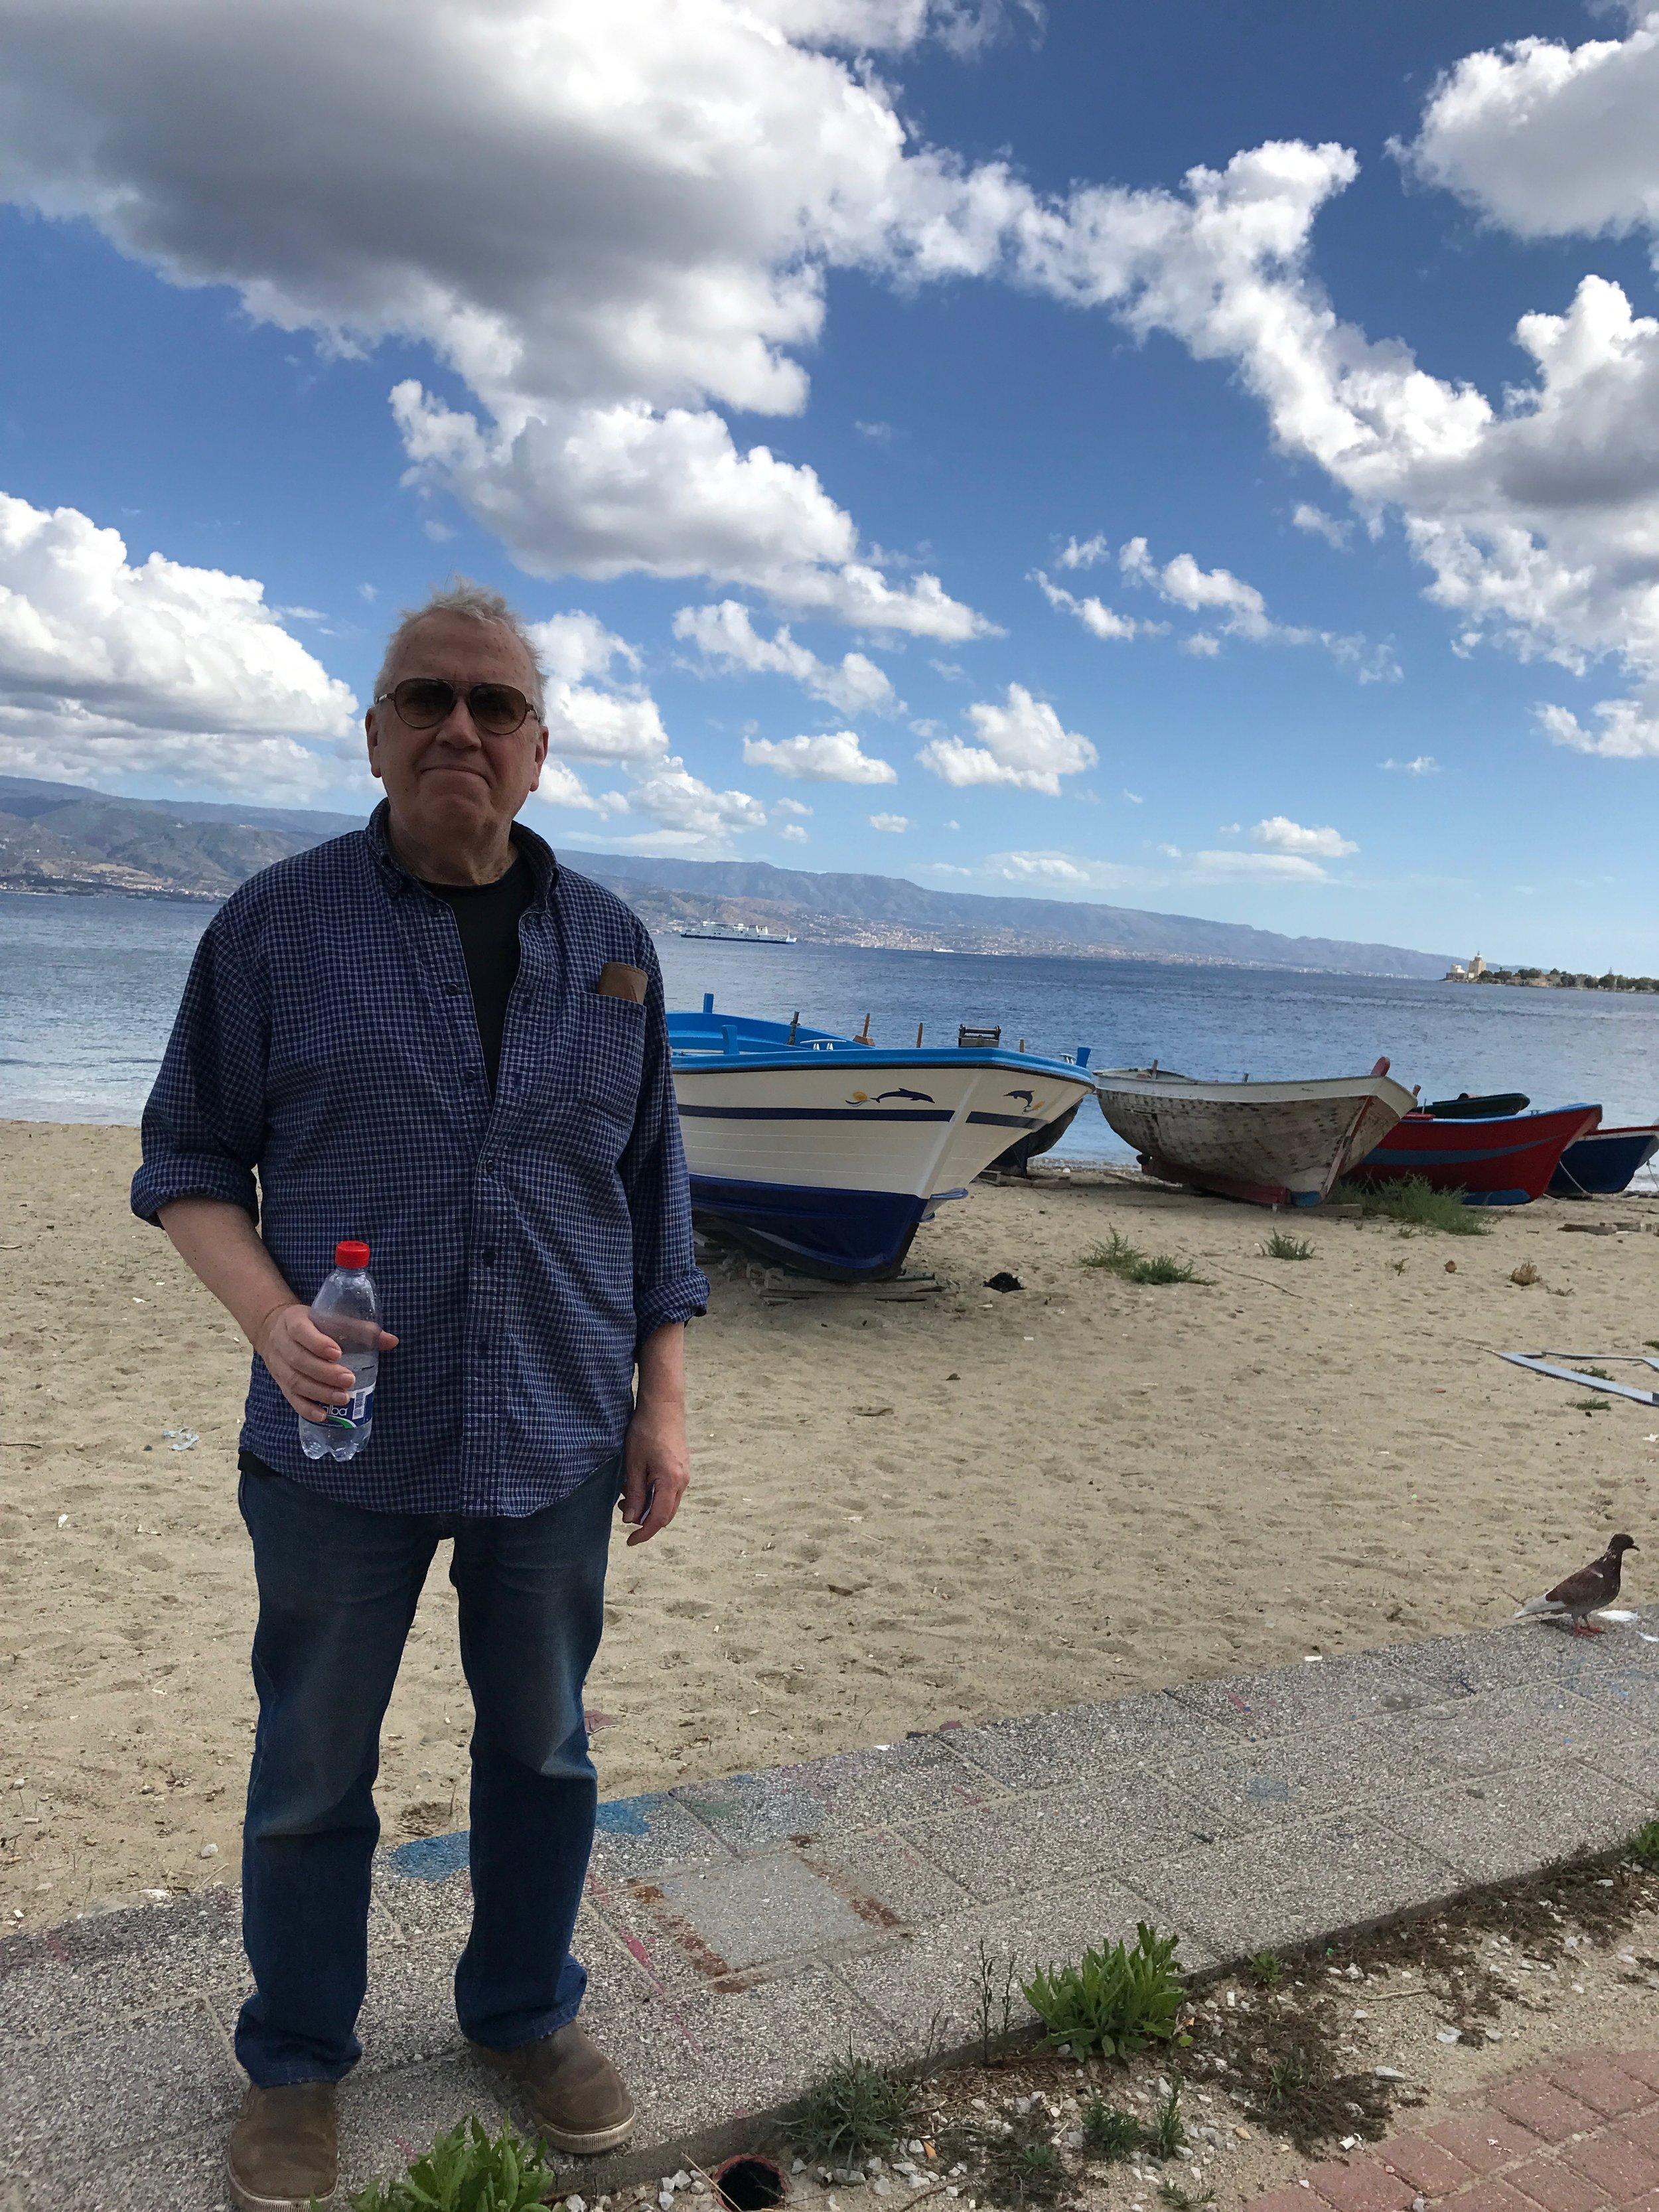 At the straits of Messina